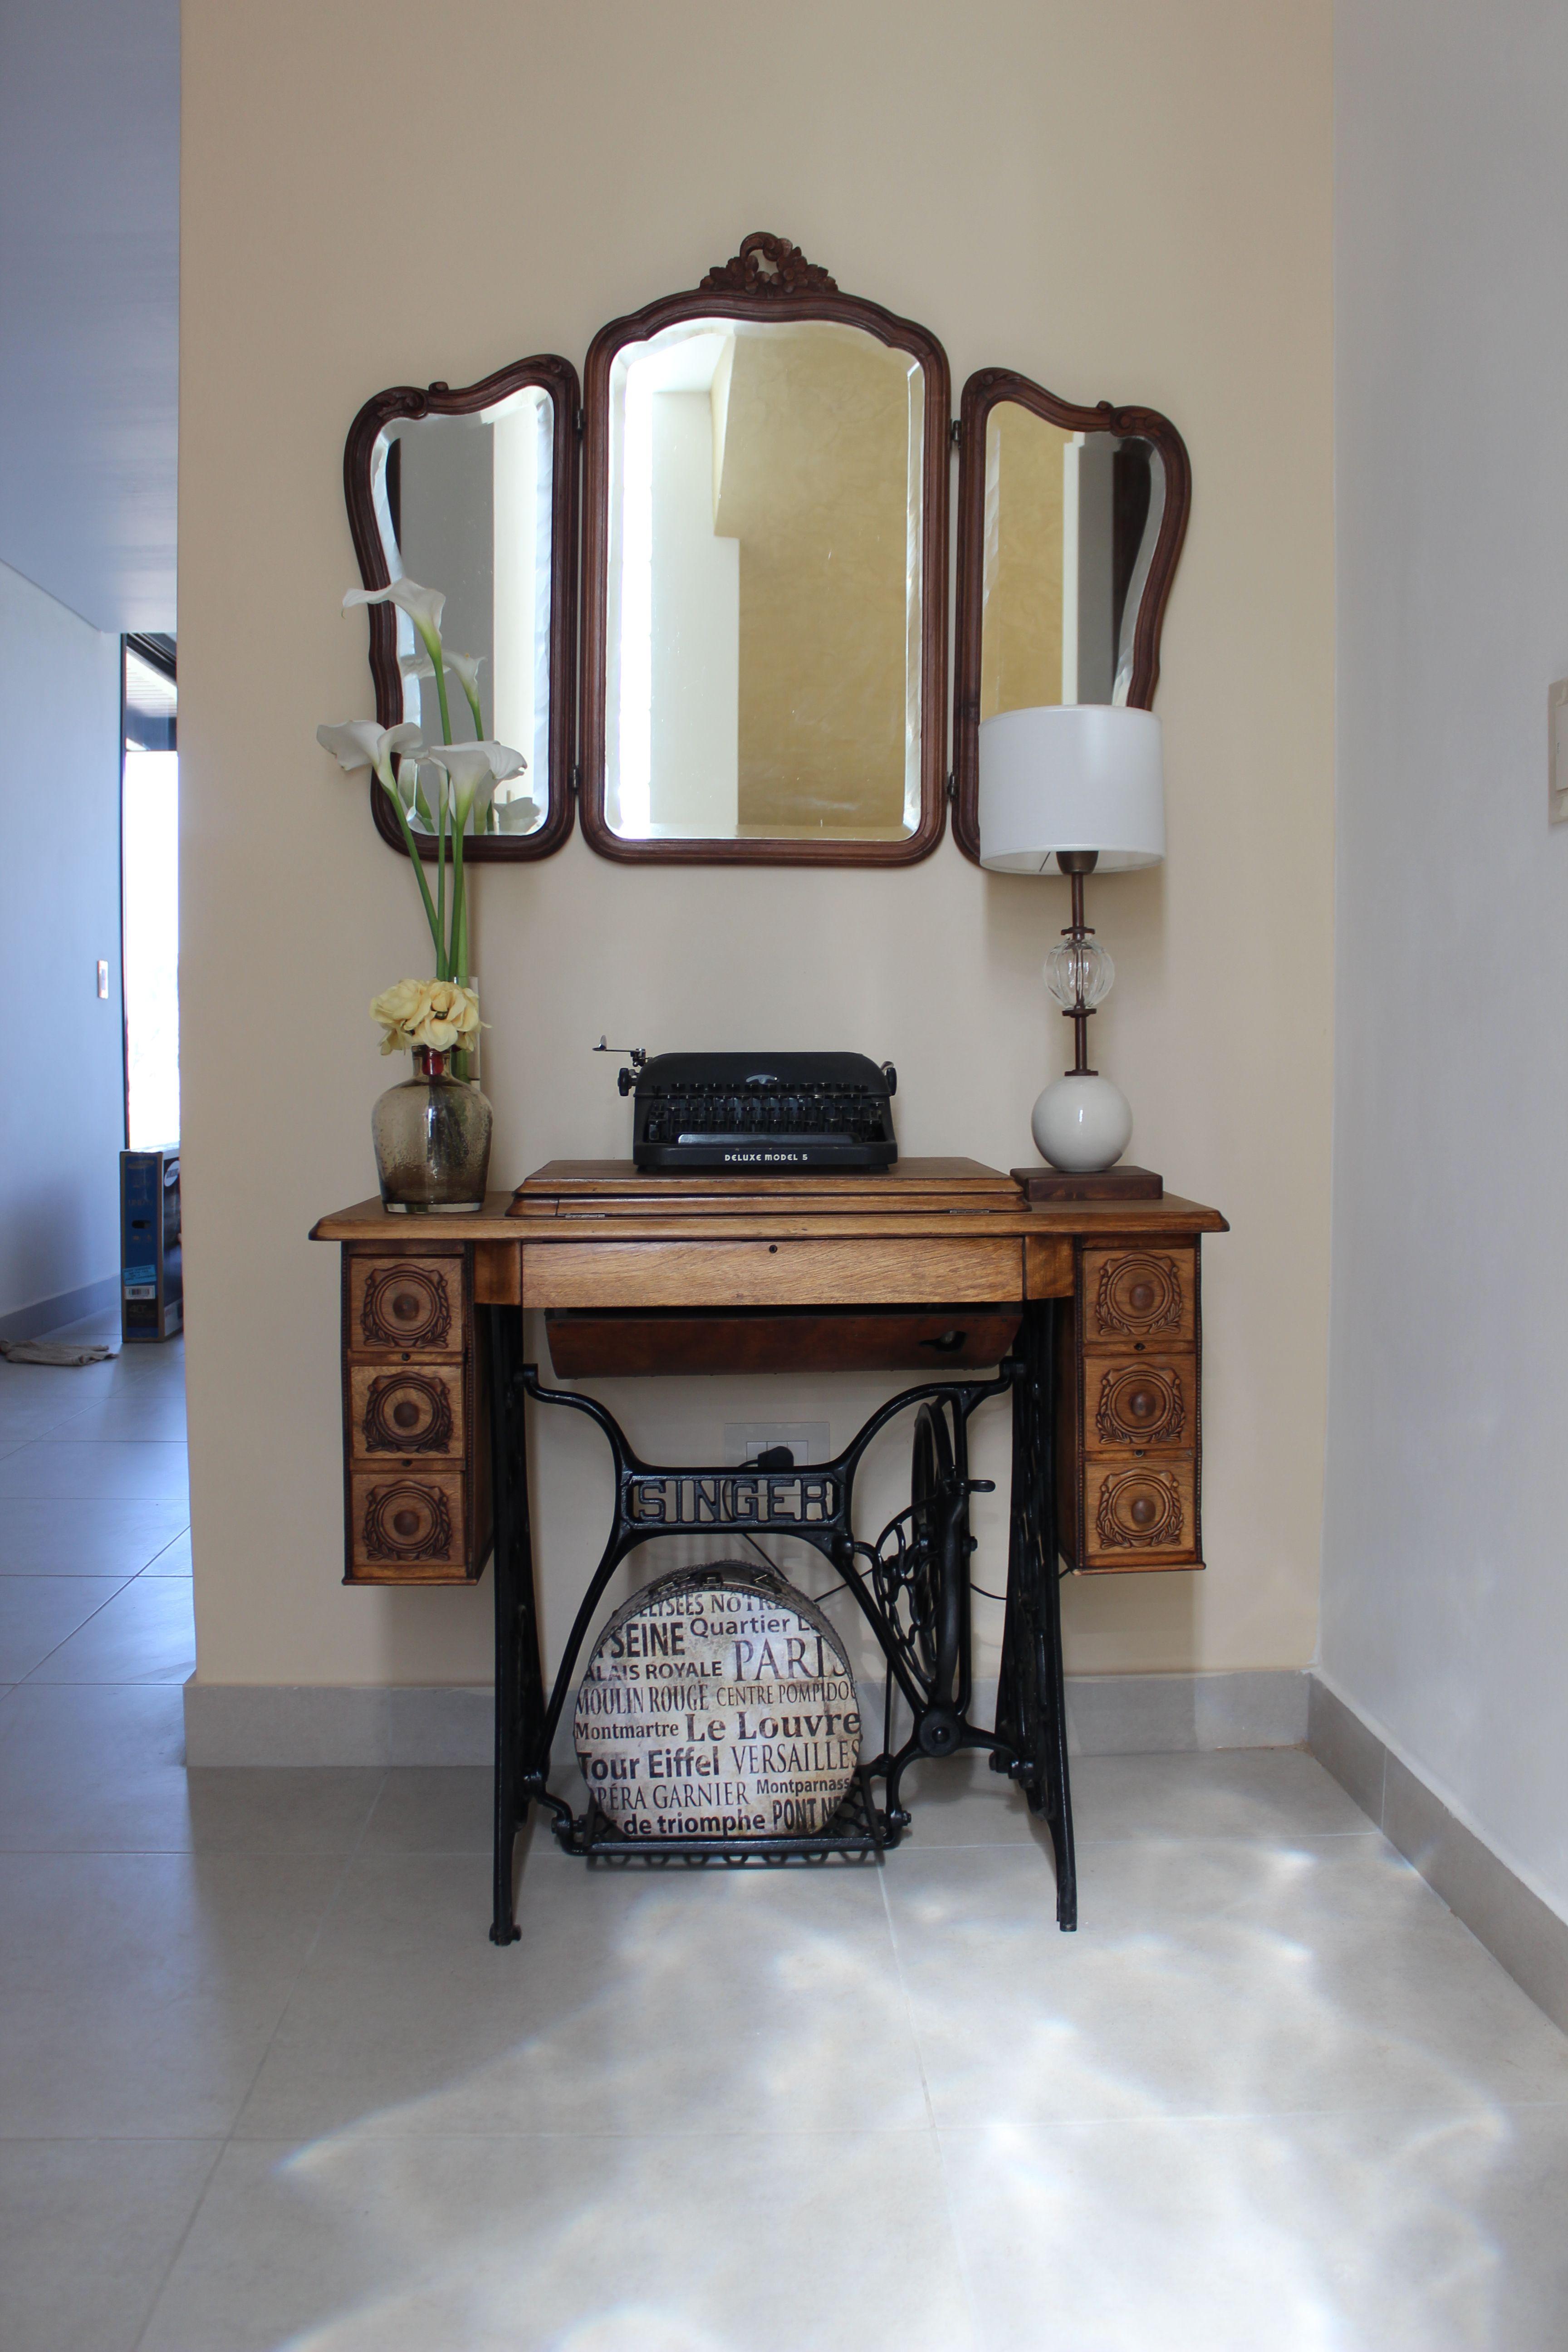 Maquina De Coser Restaurada Maquina De Escribir Antigua Espejo  # Muebles Maquina De Coser Segunda Mano